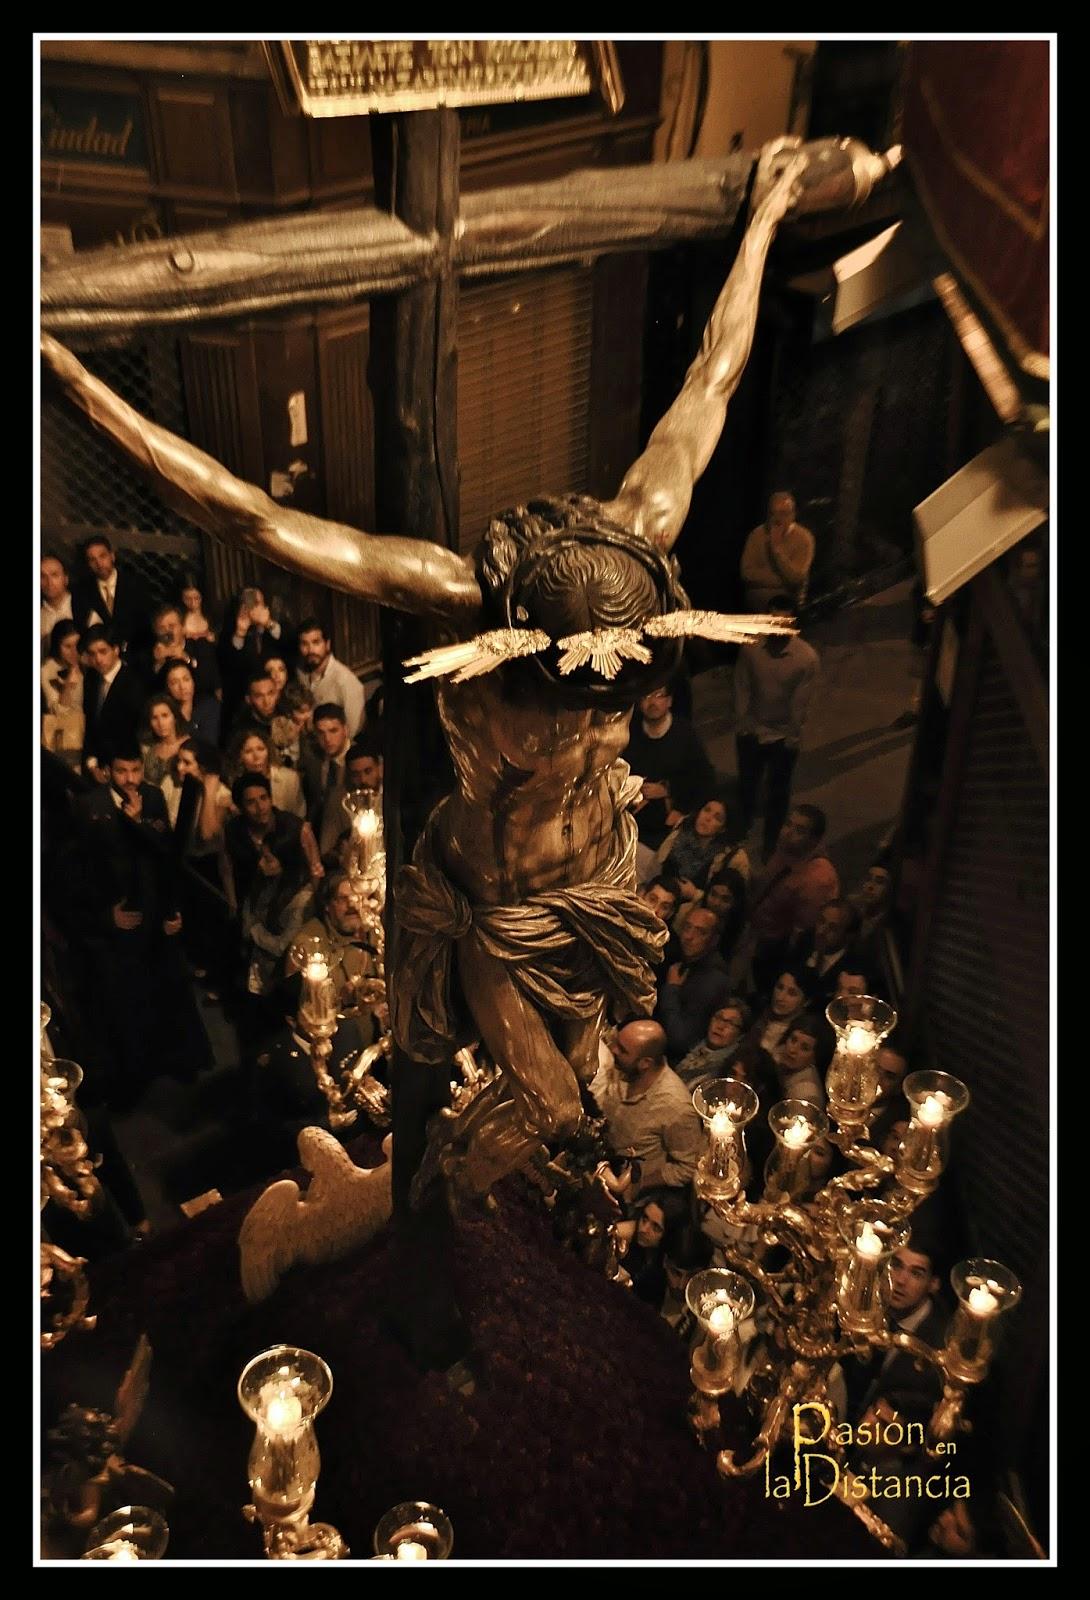 Semana-Santa-El-Amor-Sevilla-2015